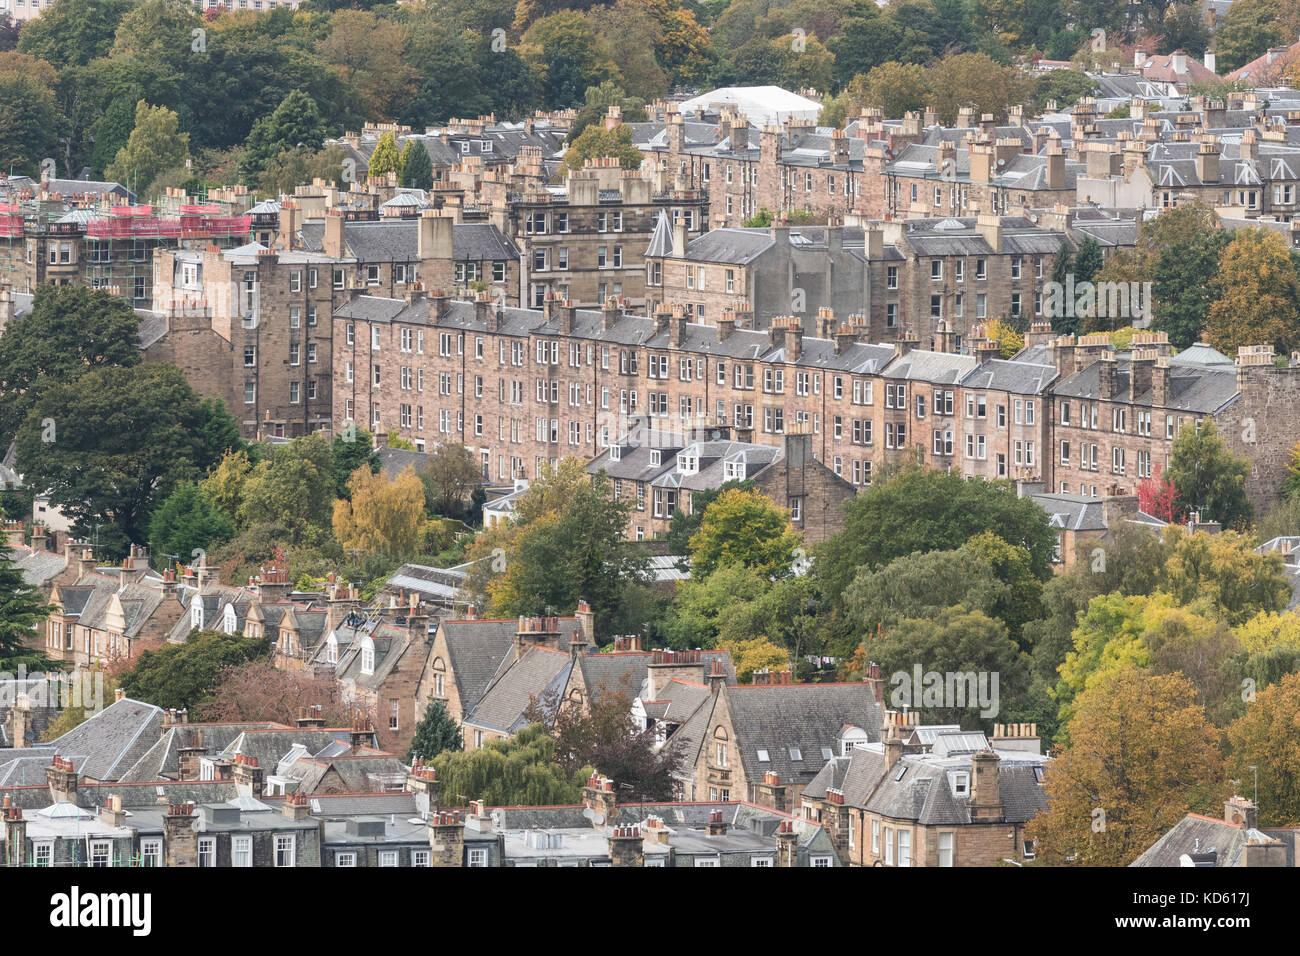 Edinburgh tenement buildings,  Morningside, Edinburgh, Scotland, UK - Stock Image